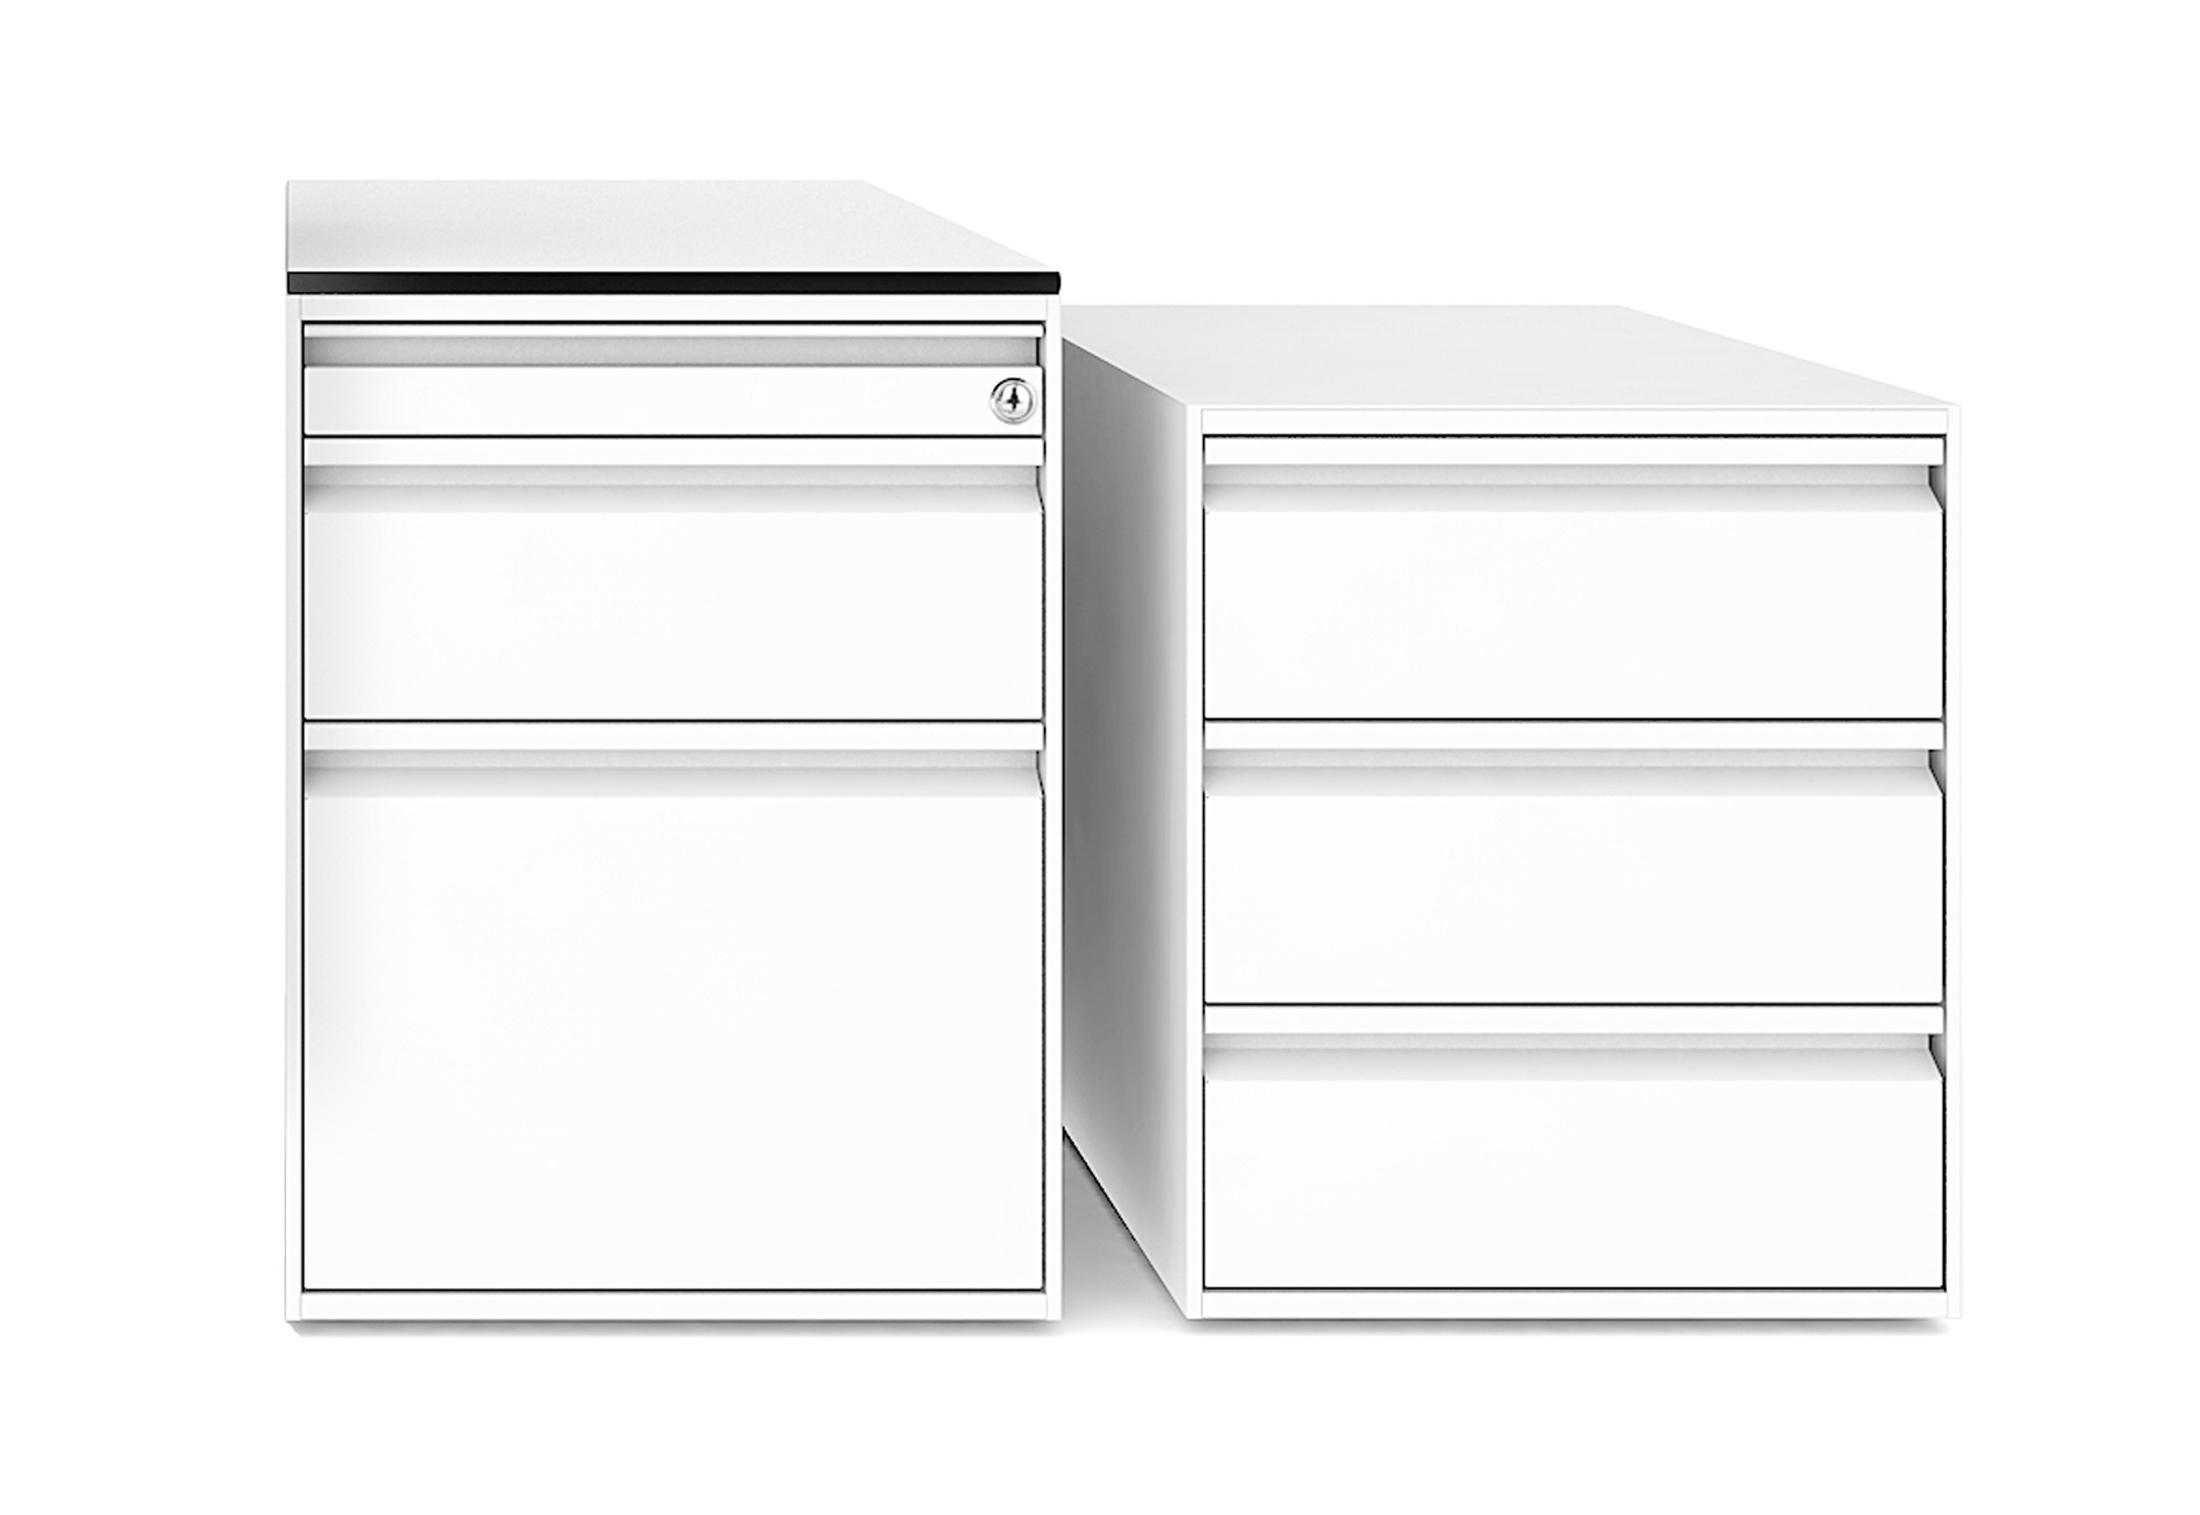 adrian and van design units unit steel mfg guard commercial weather drawer ranger interiors durham